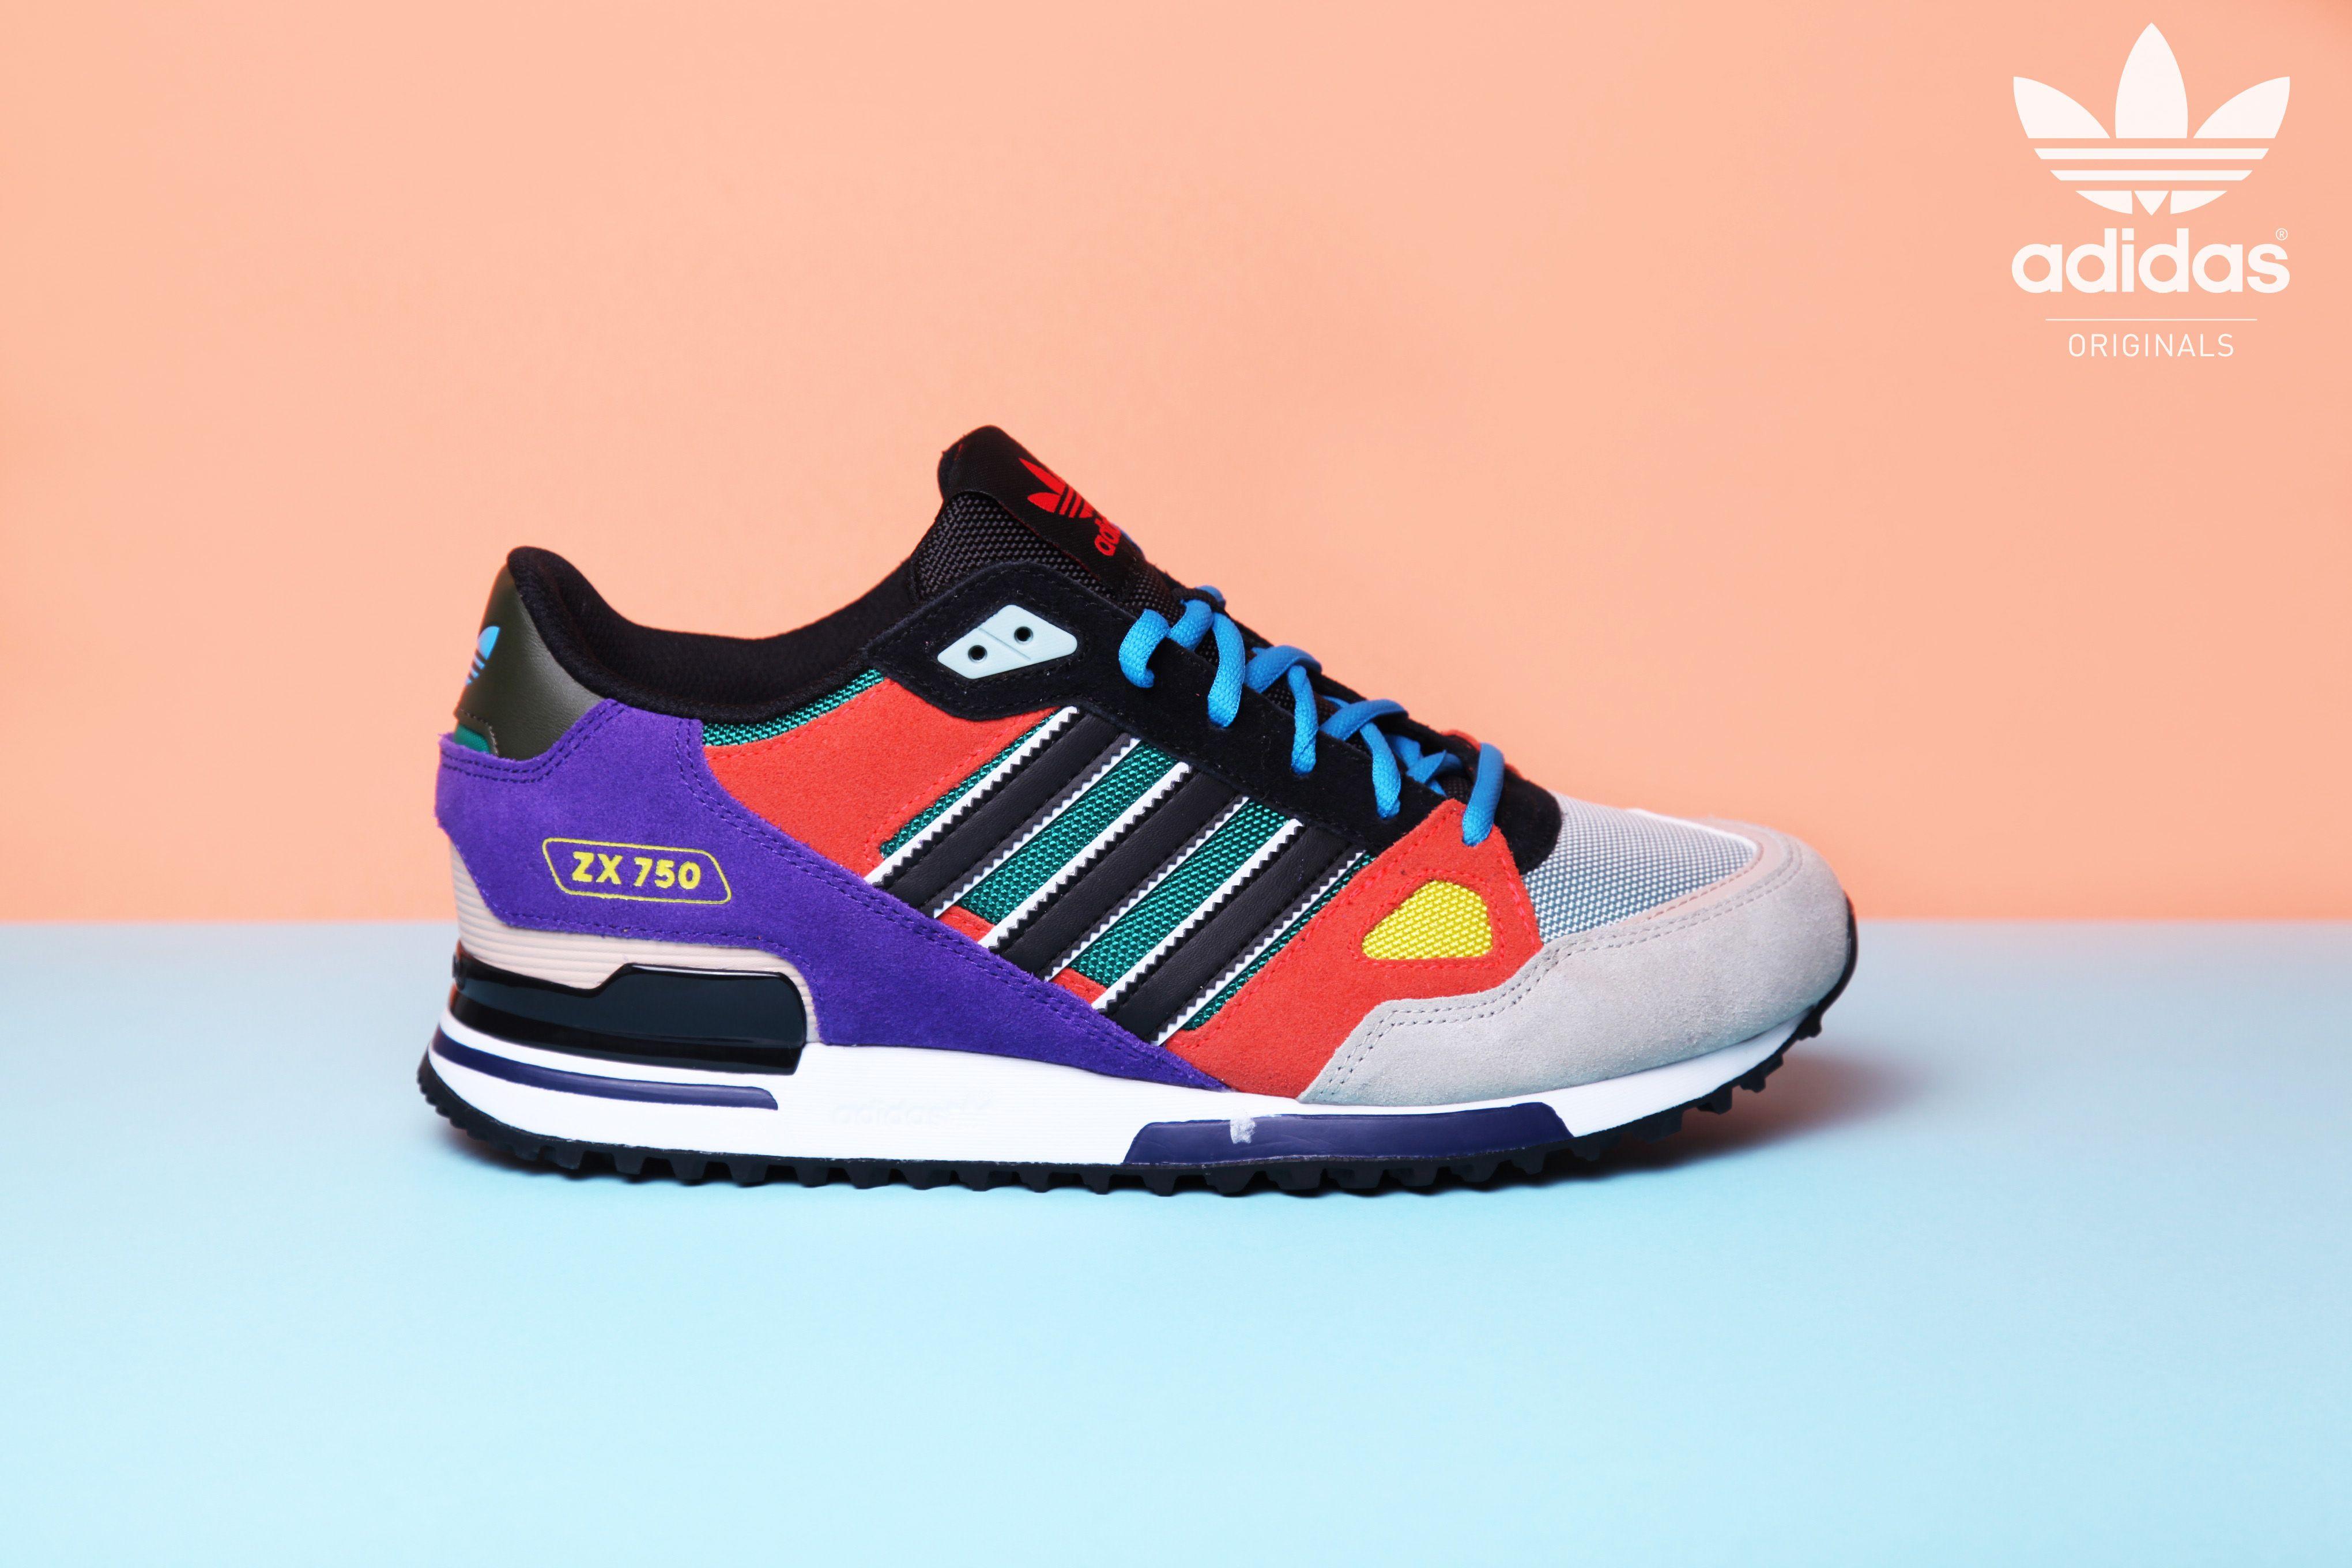 competitive price 2aa1d 31690 Zapatillas Adidas ZX 750 af6292 multicolor en  brutalzapas  www.brutalzapas.com  shoes